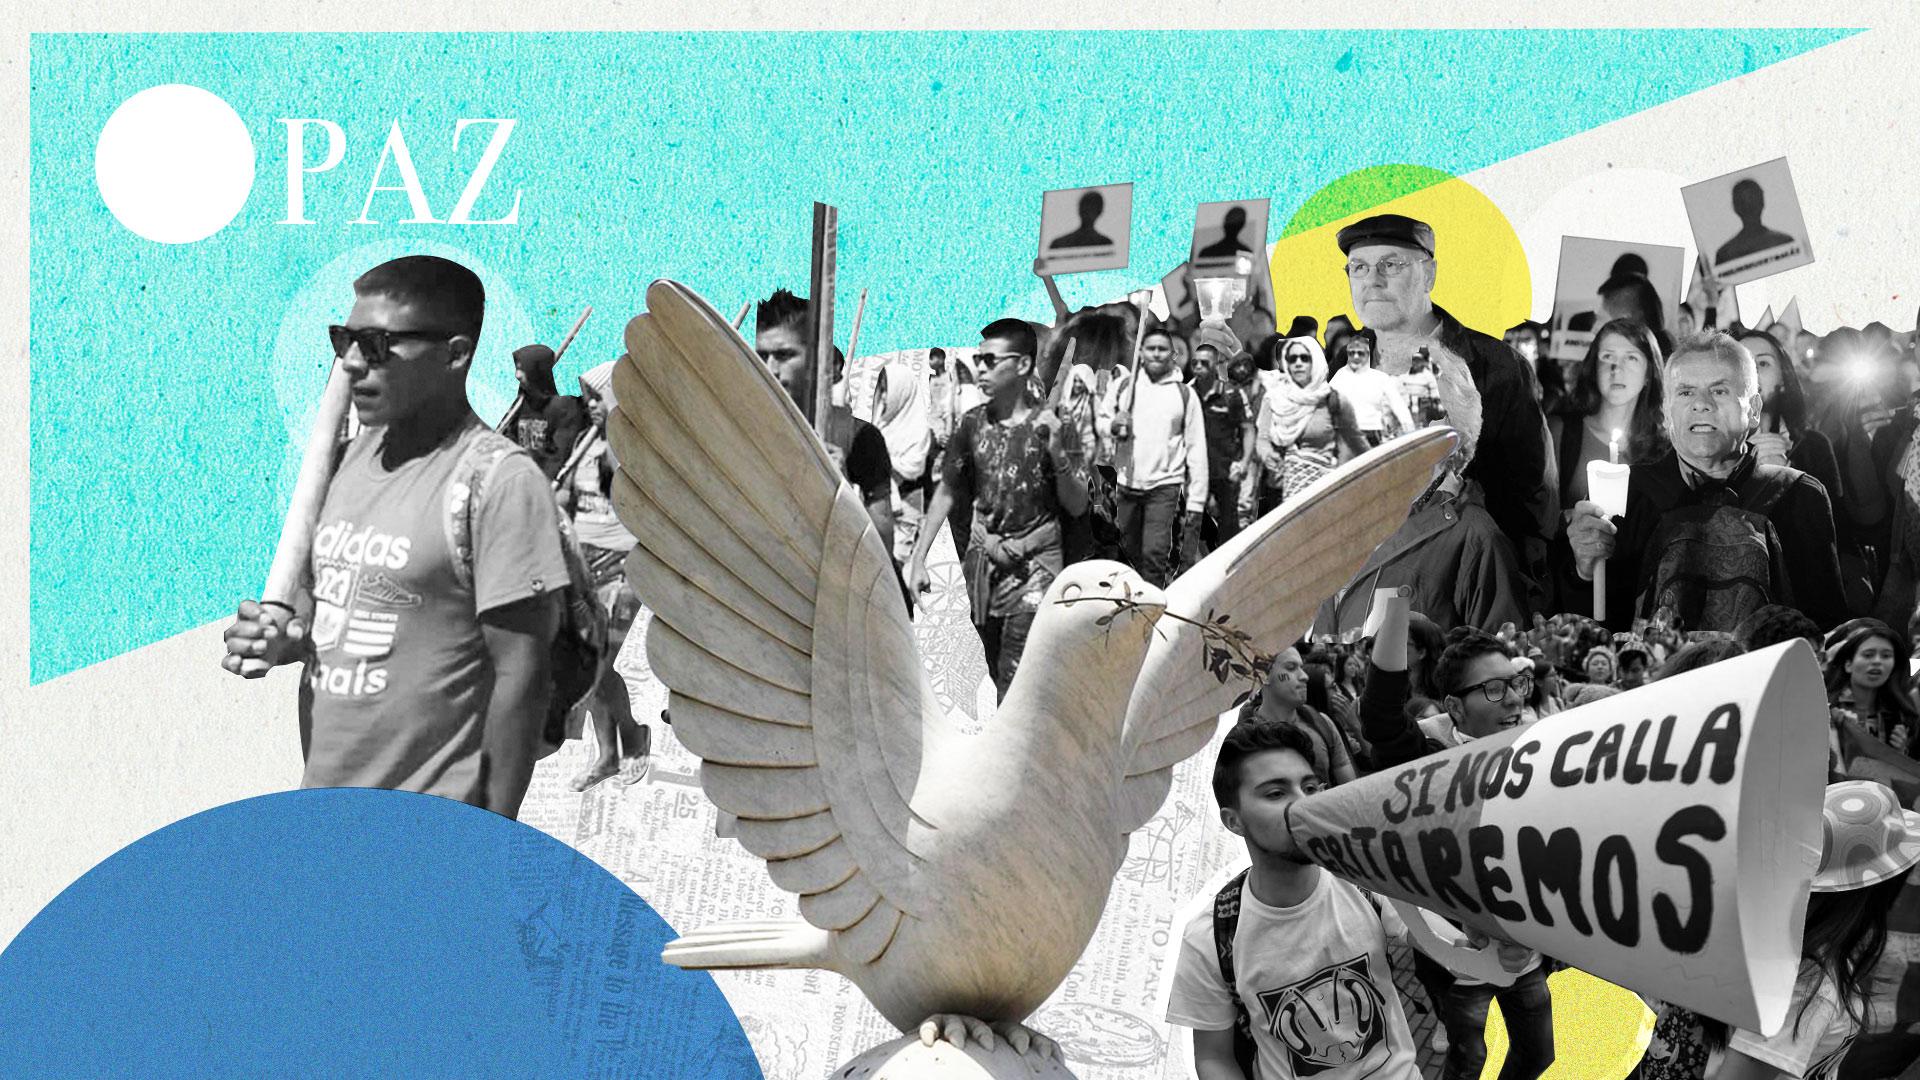 EDITORIAL | Esta paz debe ser a prueba de balas